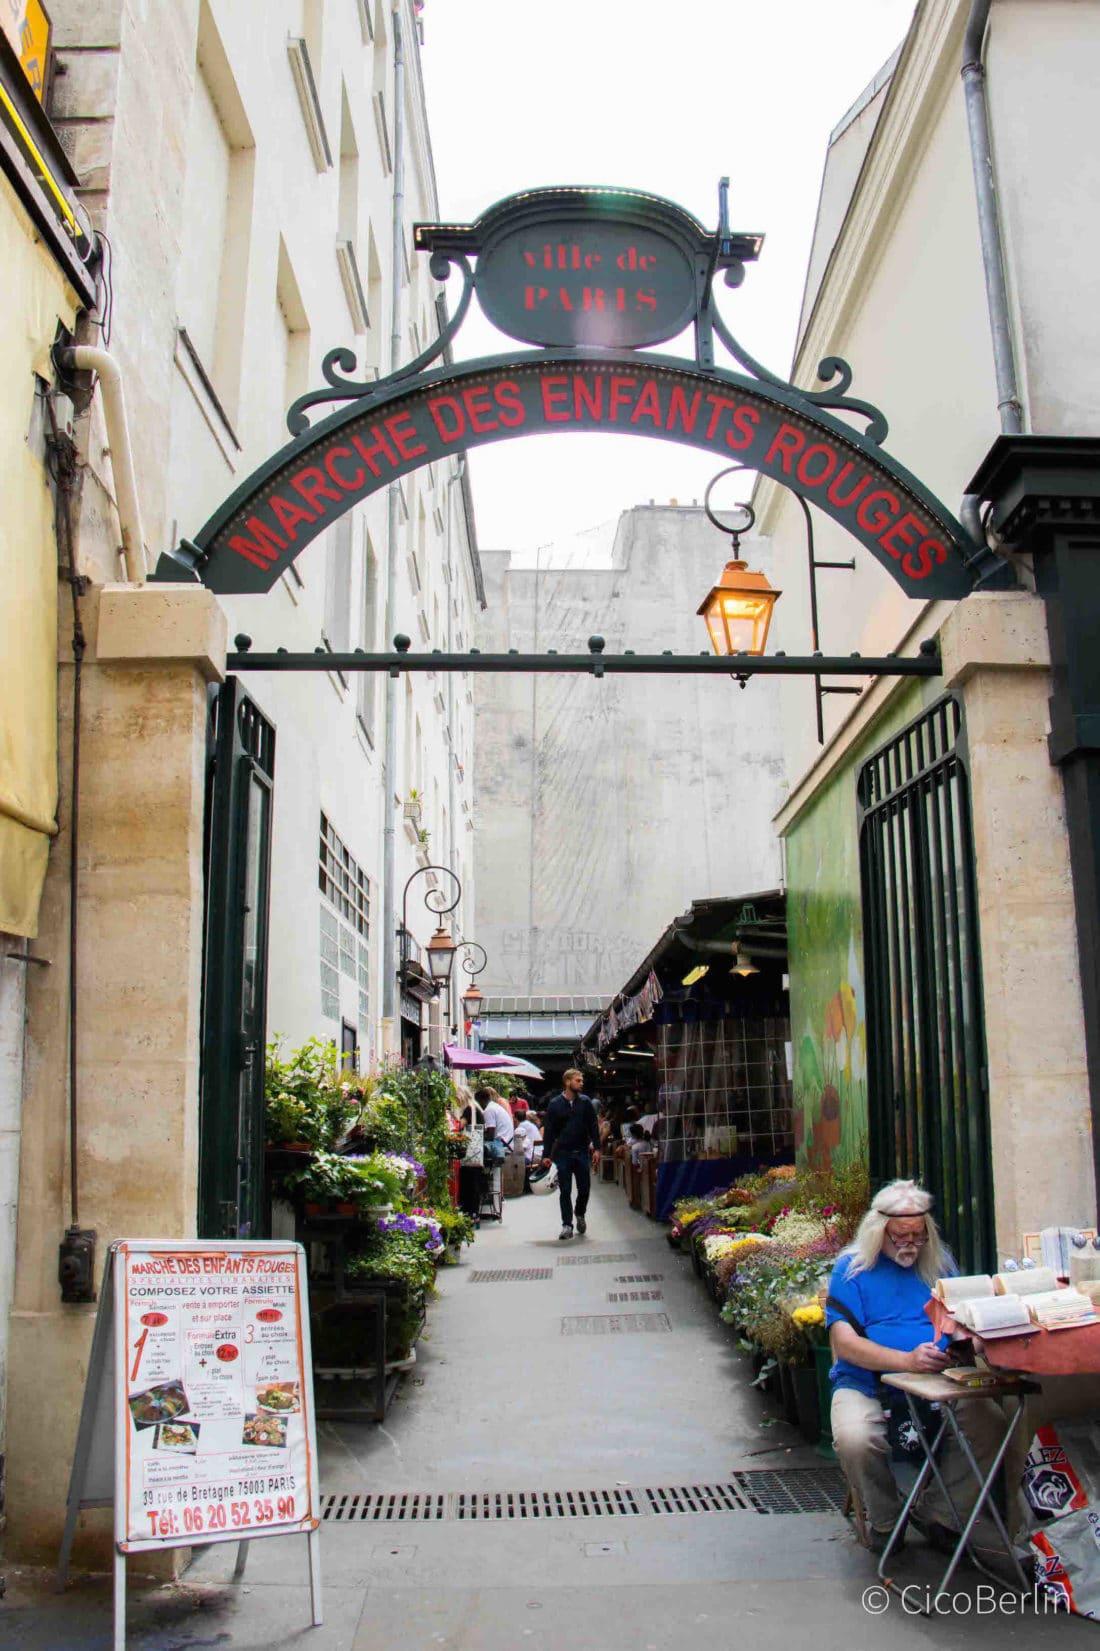 Städtereise Paris Tipps, Streetfood Markt, Marché des Enfants Rouges